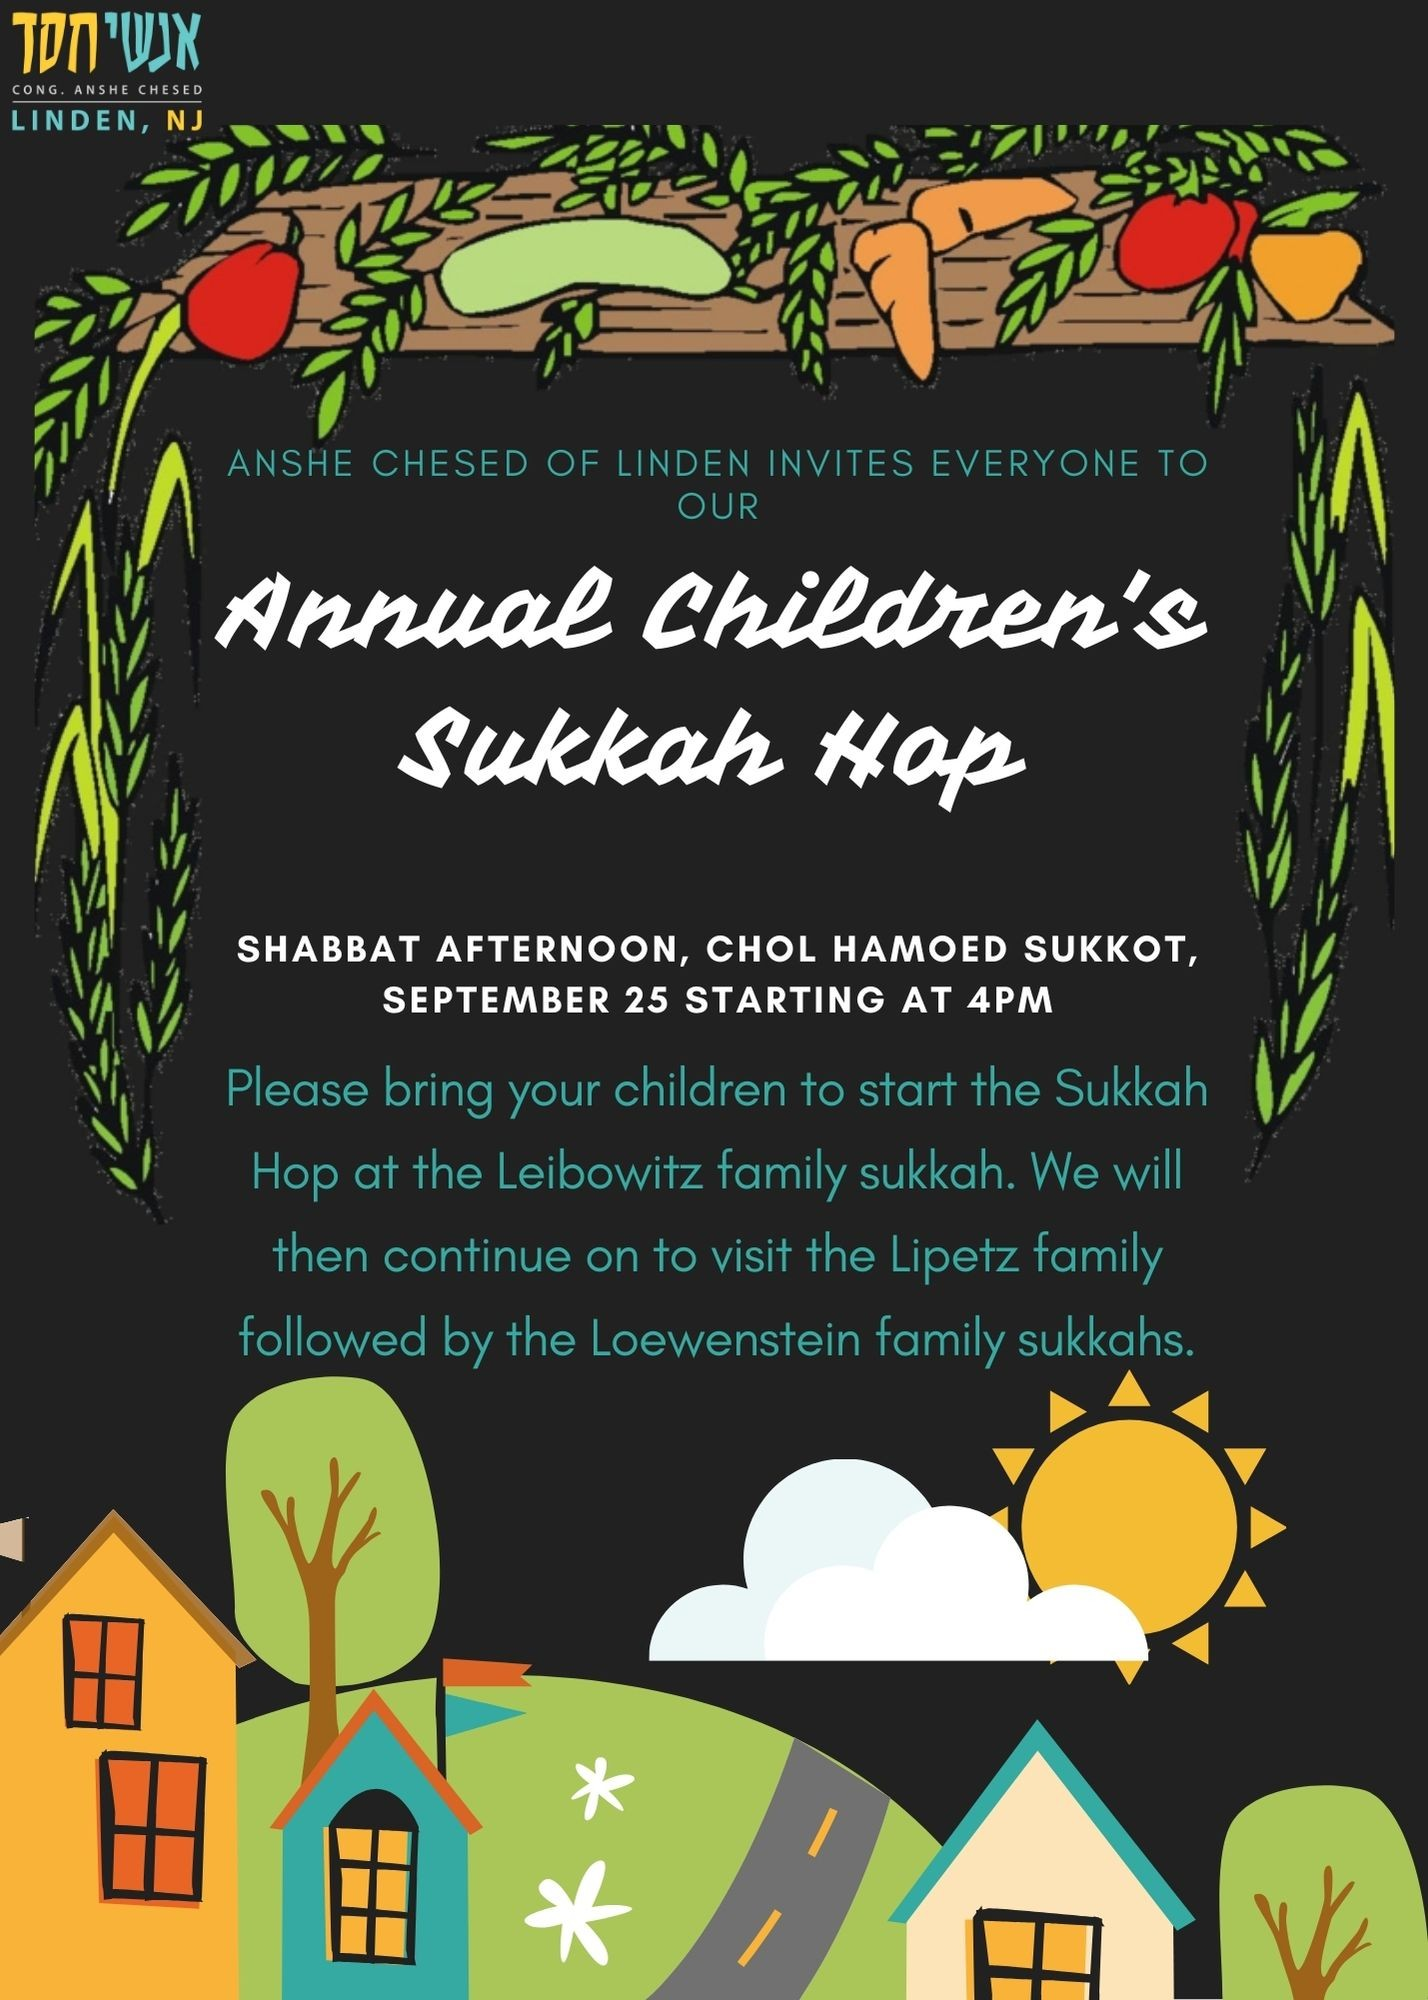 Banner Image for Annual Children's Sukkah Hop